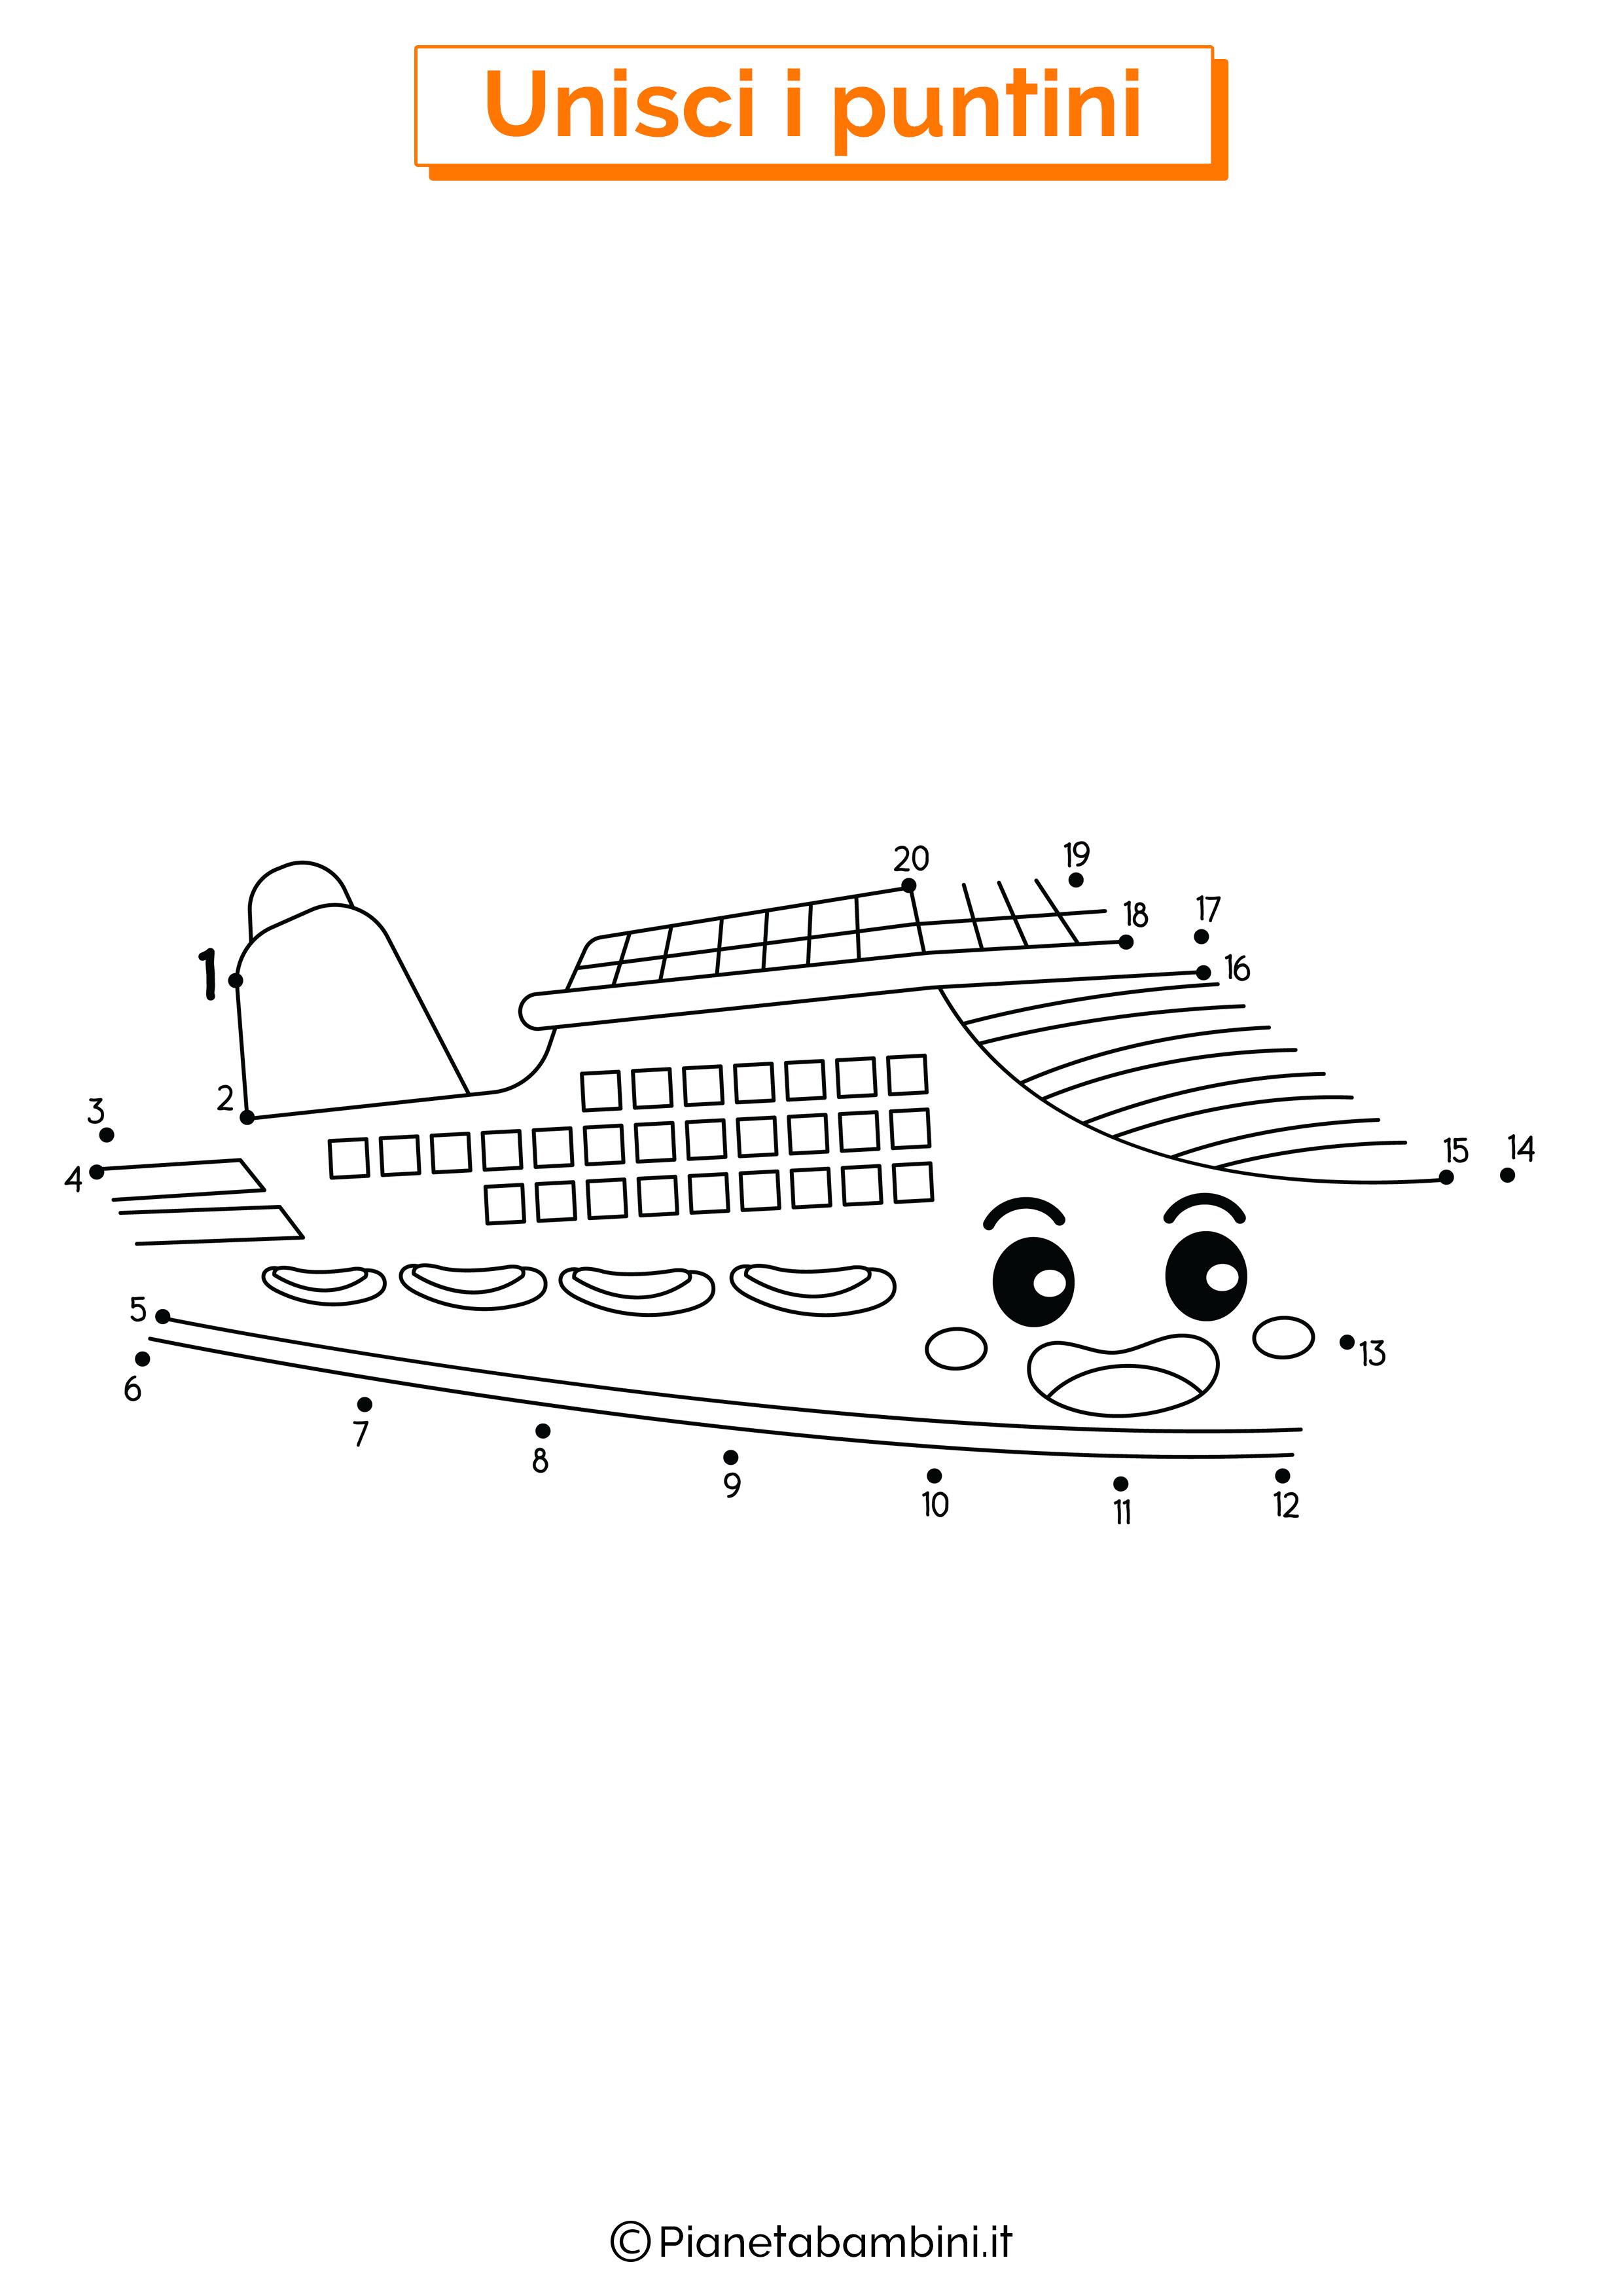 Disegno unisci i puntini nave